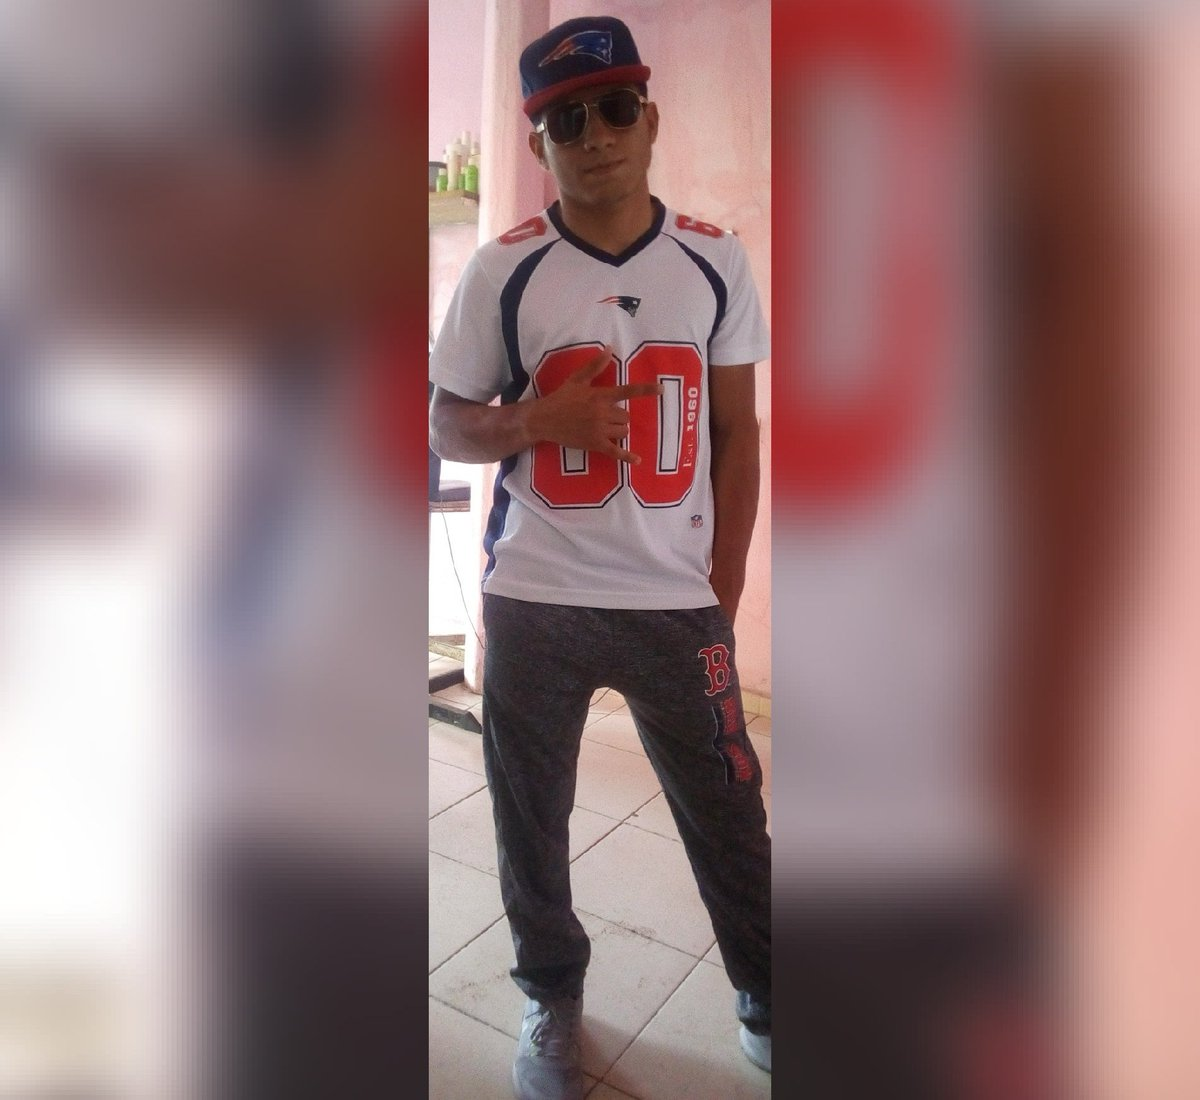 RT @OvandoJimmy: #FanNFL #LaLeyDelMásFuerte #RitualNFL #SuperBowl Desde Villa hermosa saludos😎 https://t.co/4t9ZjT4pm9